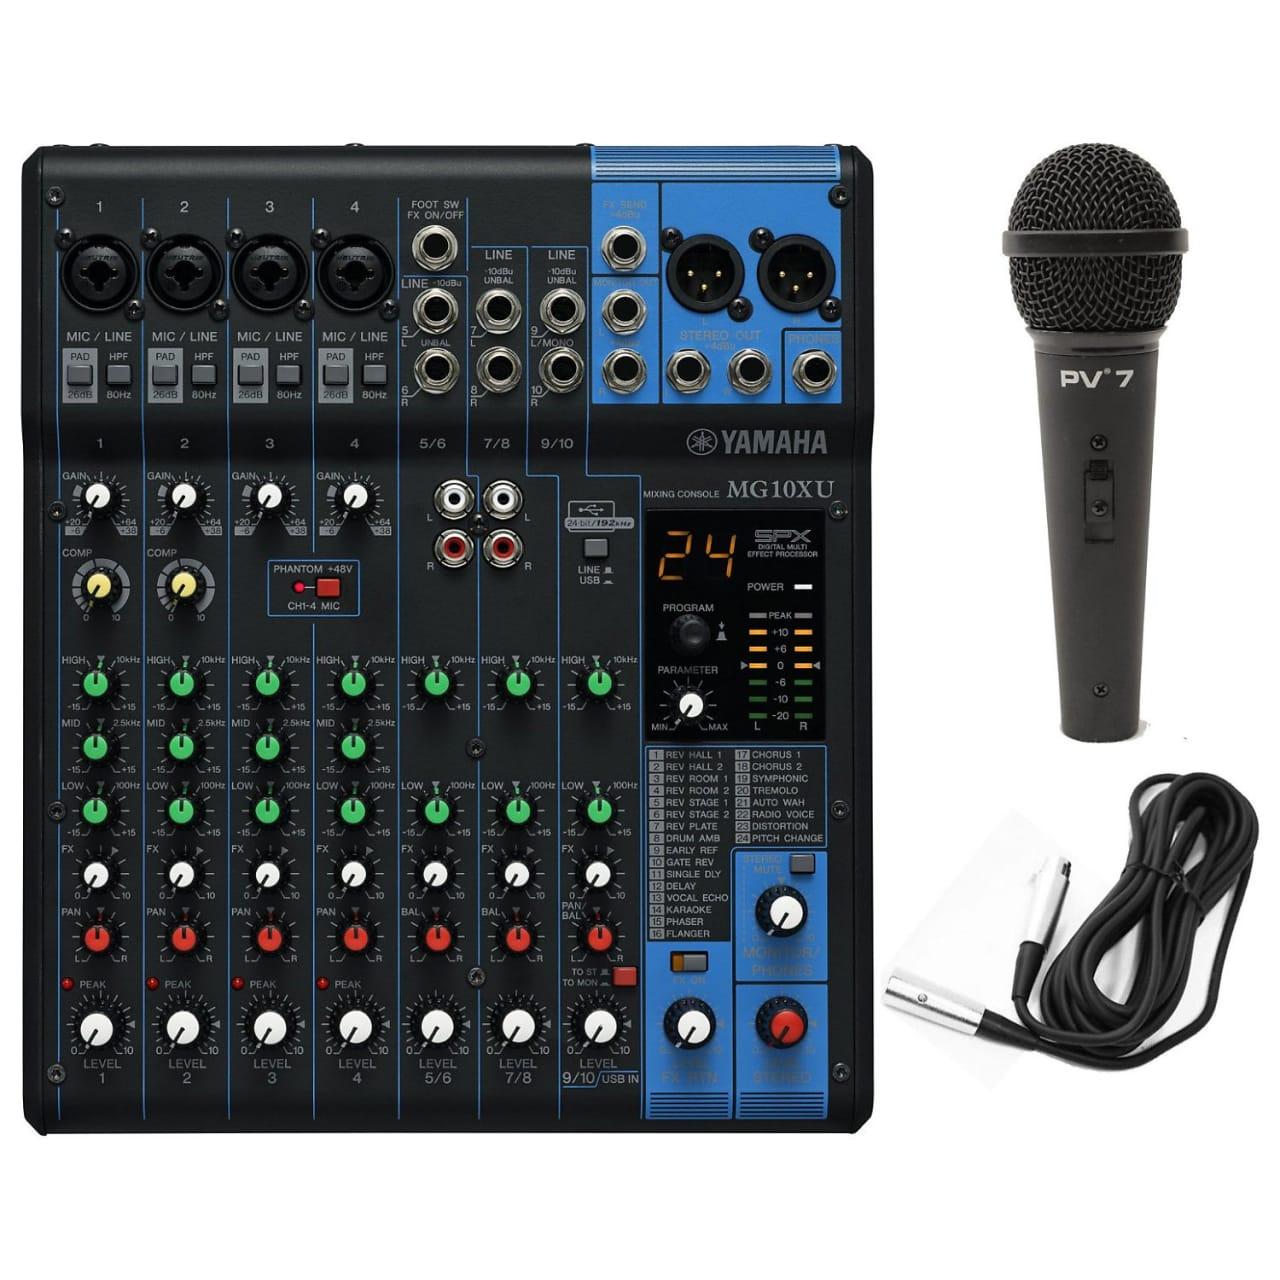 Yamaha mg10xu 10 input mixer w fx bundle black geartree for Yamaha mg10xu usb cable